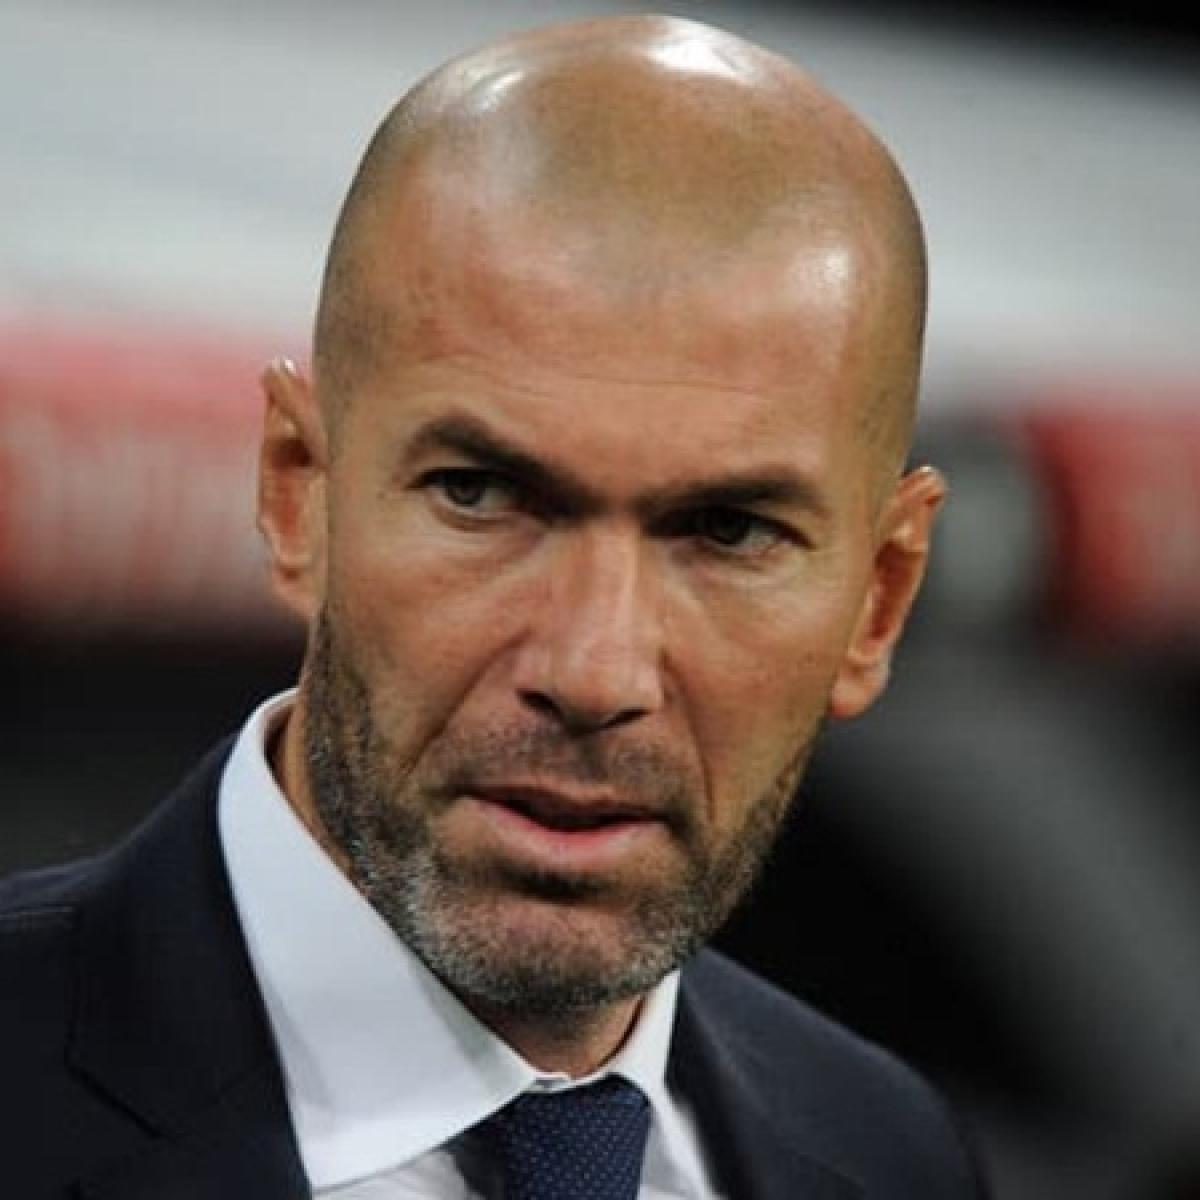 Real Madrid coach Zinedine Zidane tests positive for coronavirus